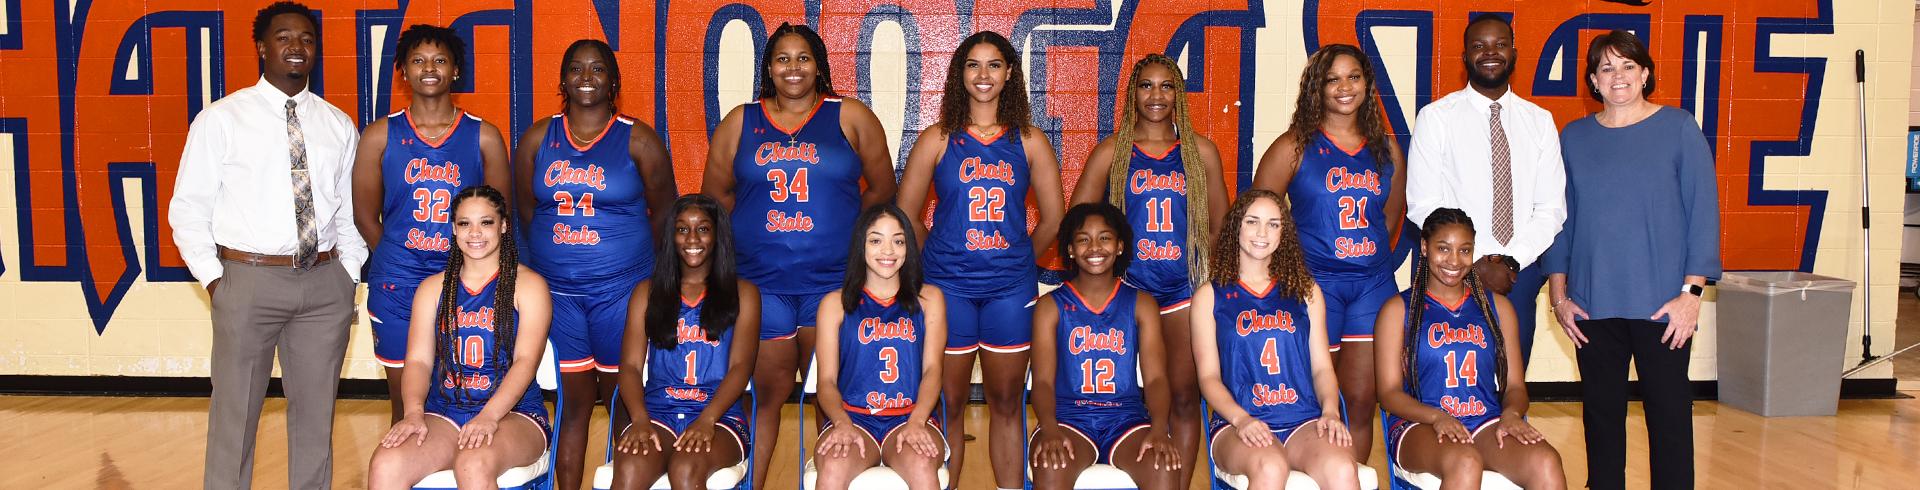 women's basketball team banner photo